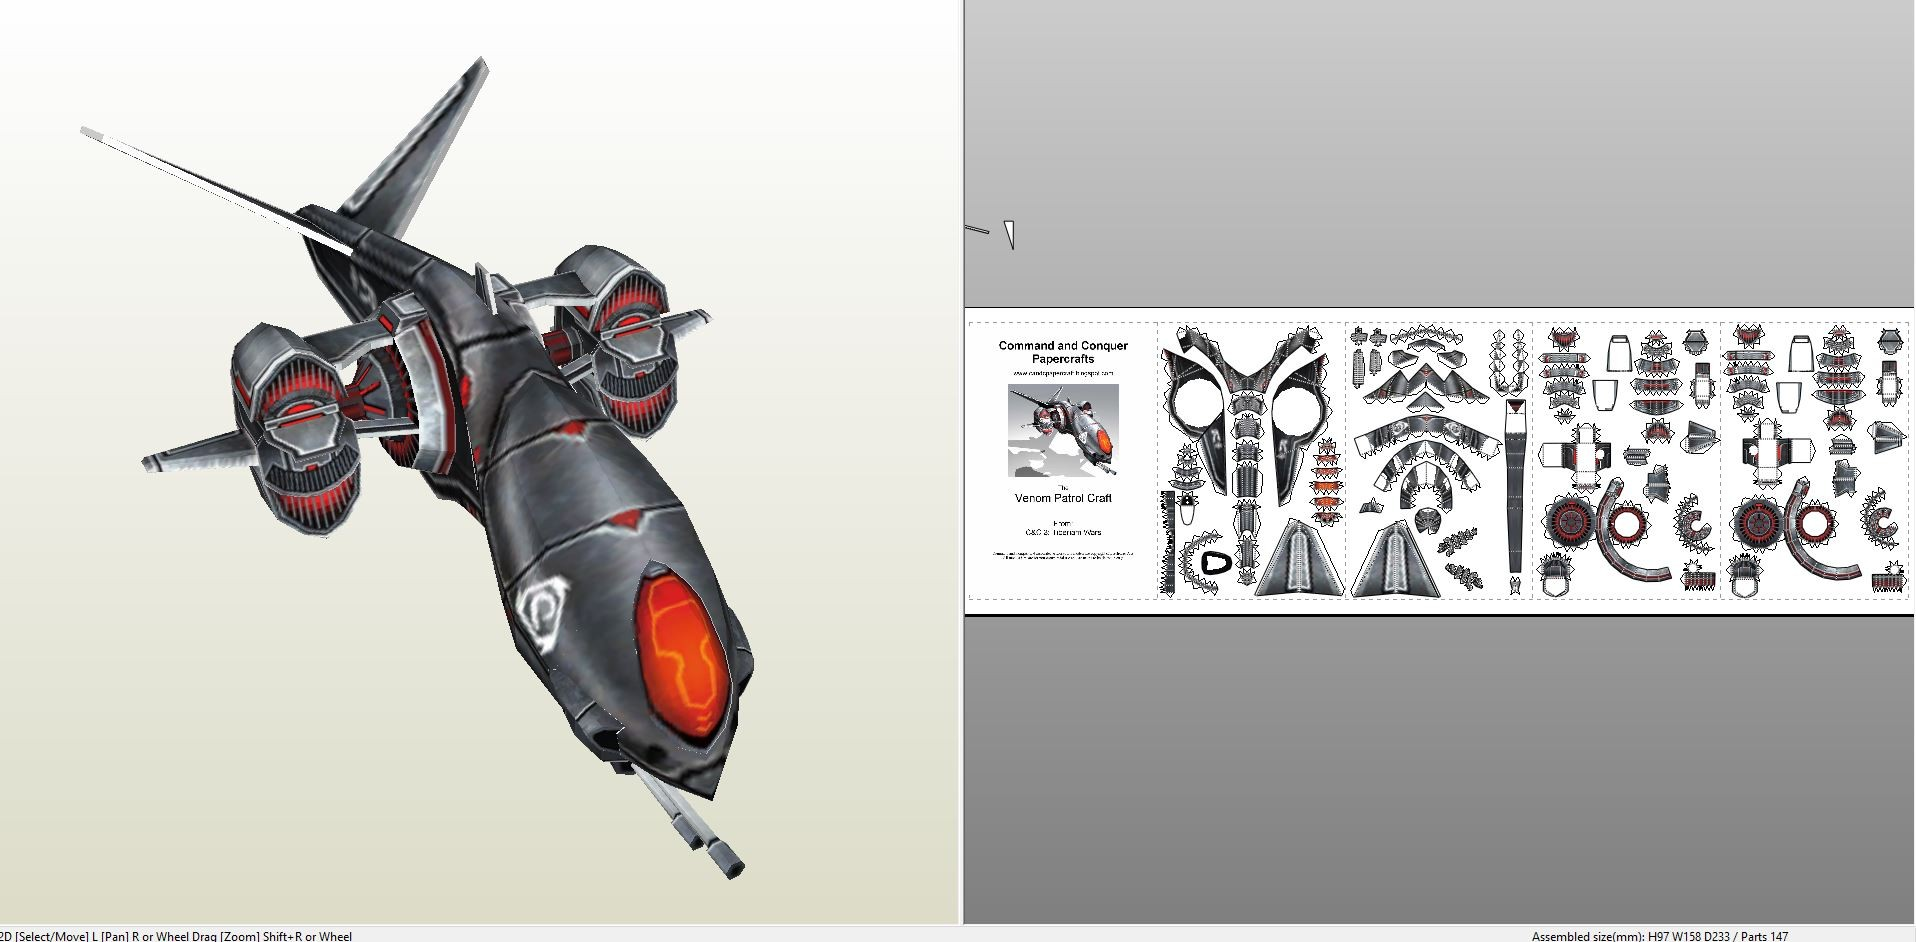 Battlestar Galactica Papercraft Papercraft Pdo File Template for Mand & Conquer Venom Aircraft